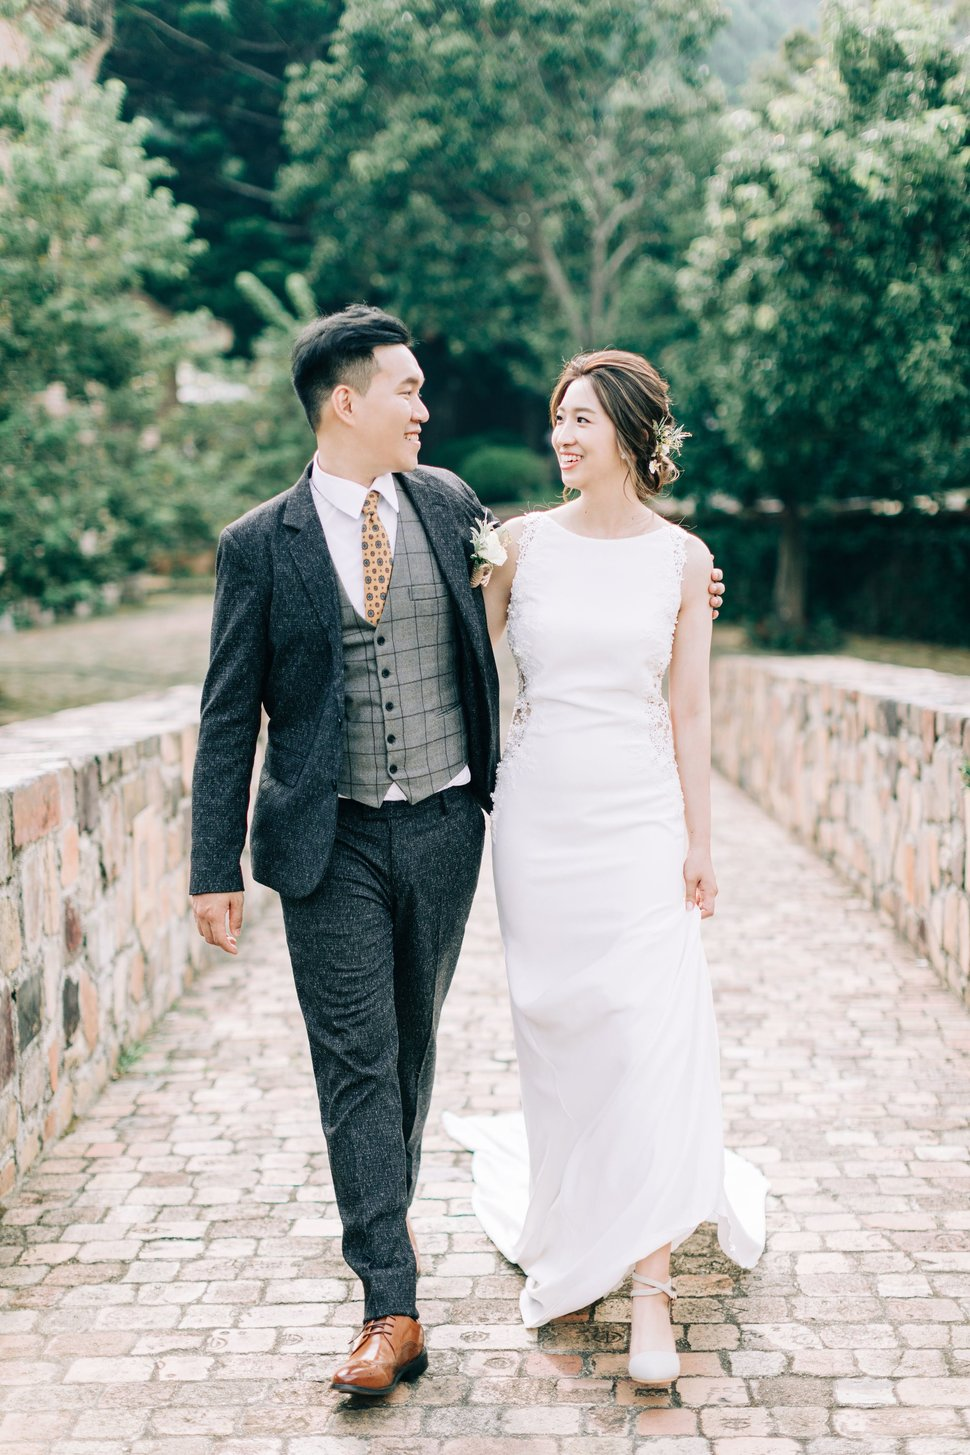 AG3_6846A - Cradle Wedding搖籃手工婚紗《結婚吧》